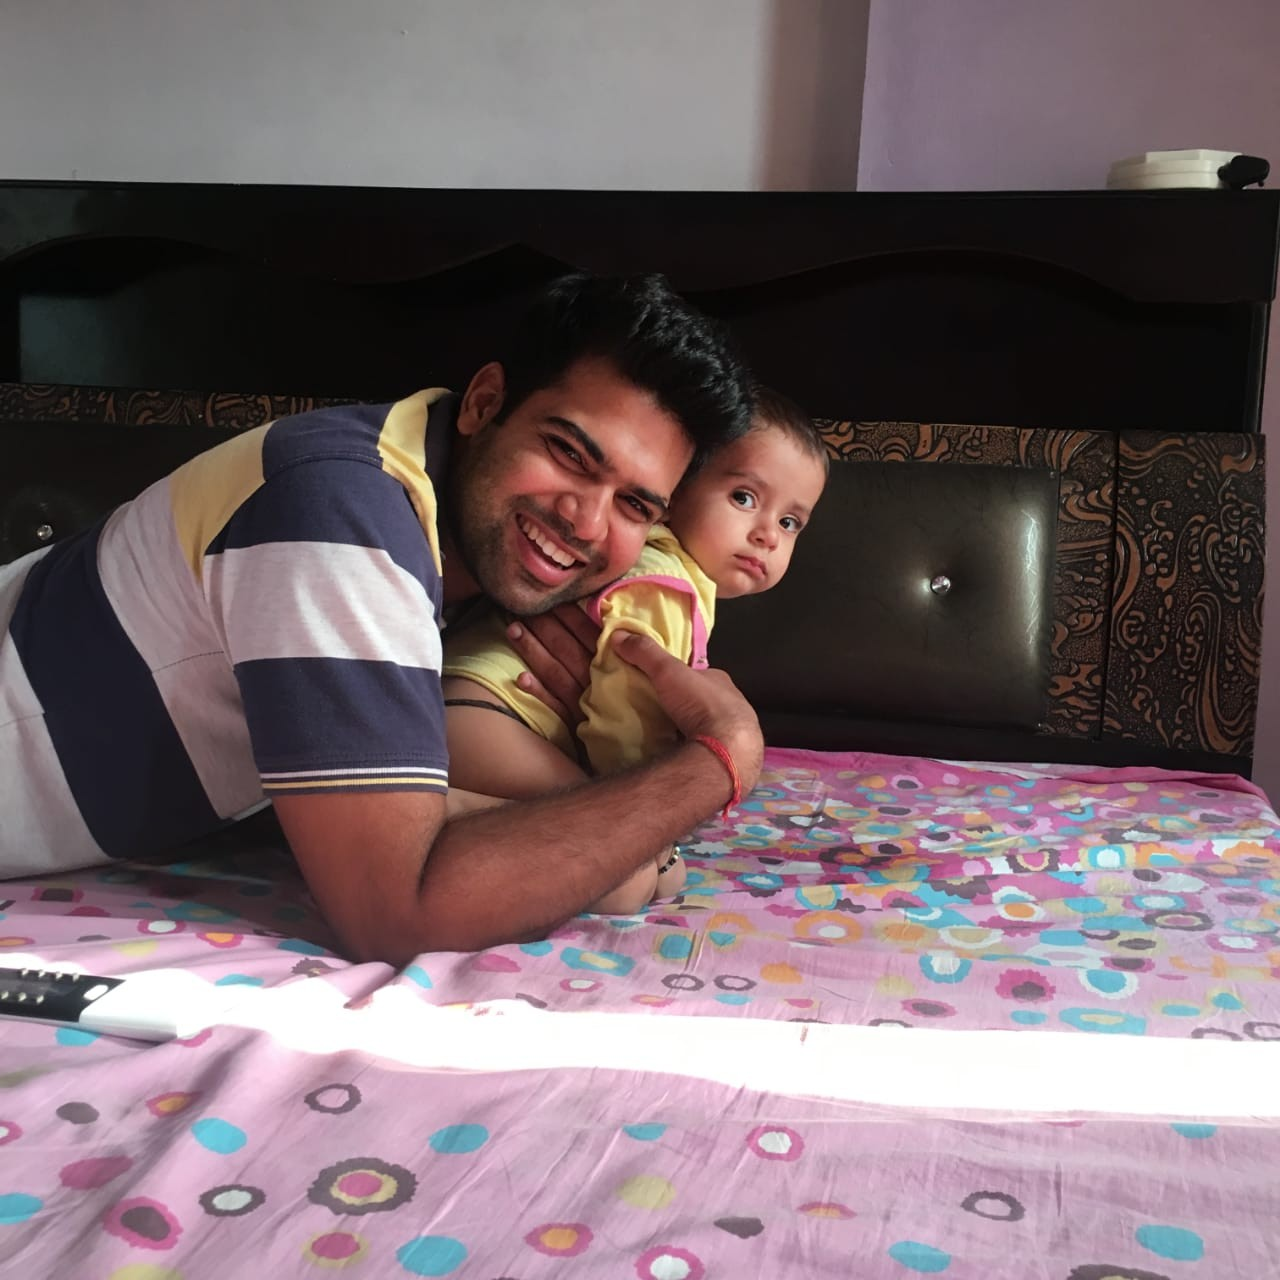 Cpl Pankaj Kumar with his son Rudransh